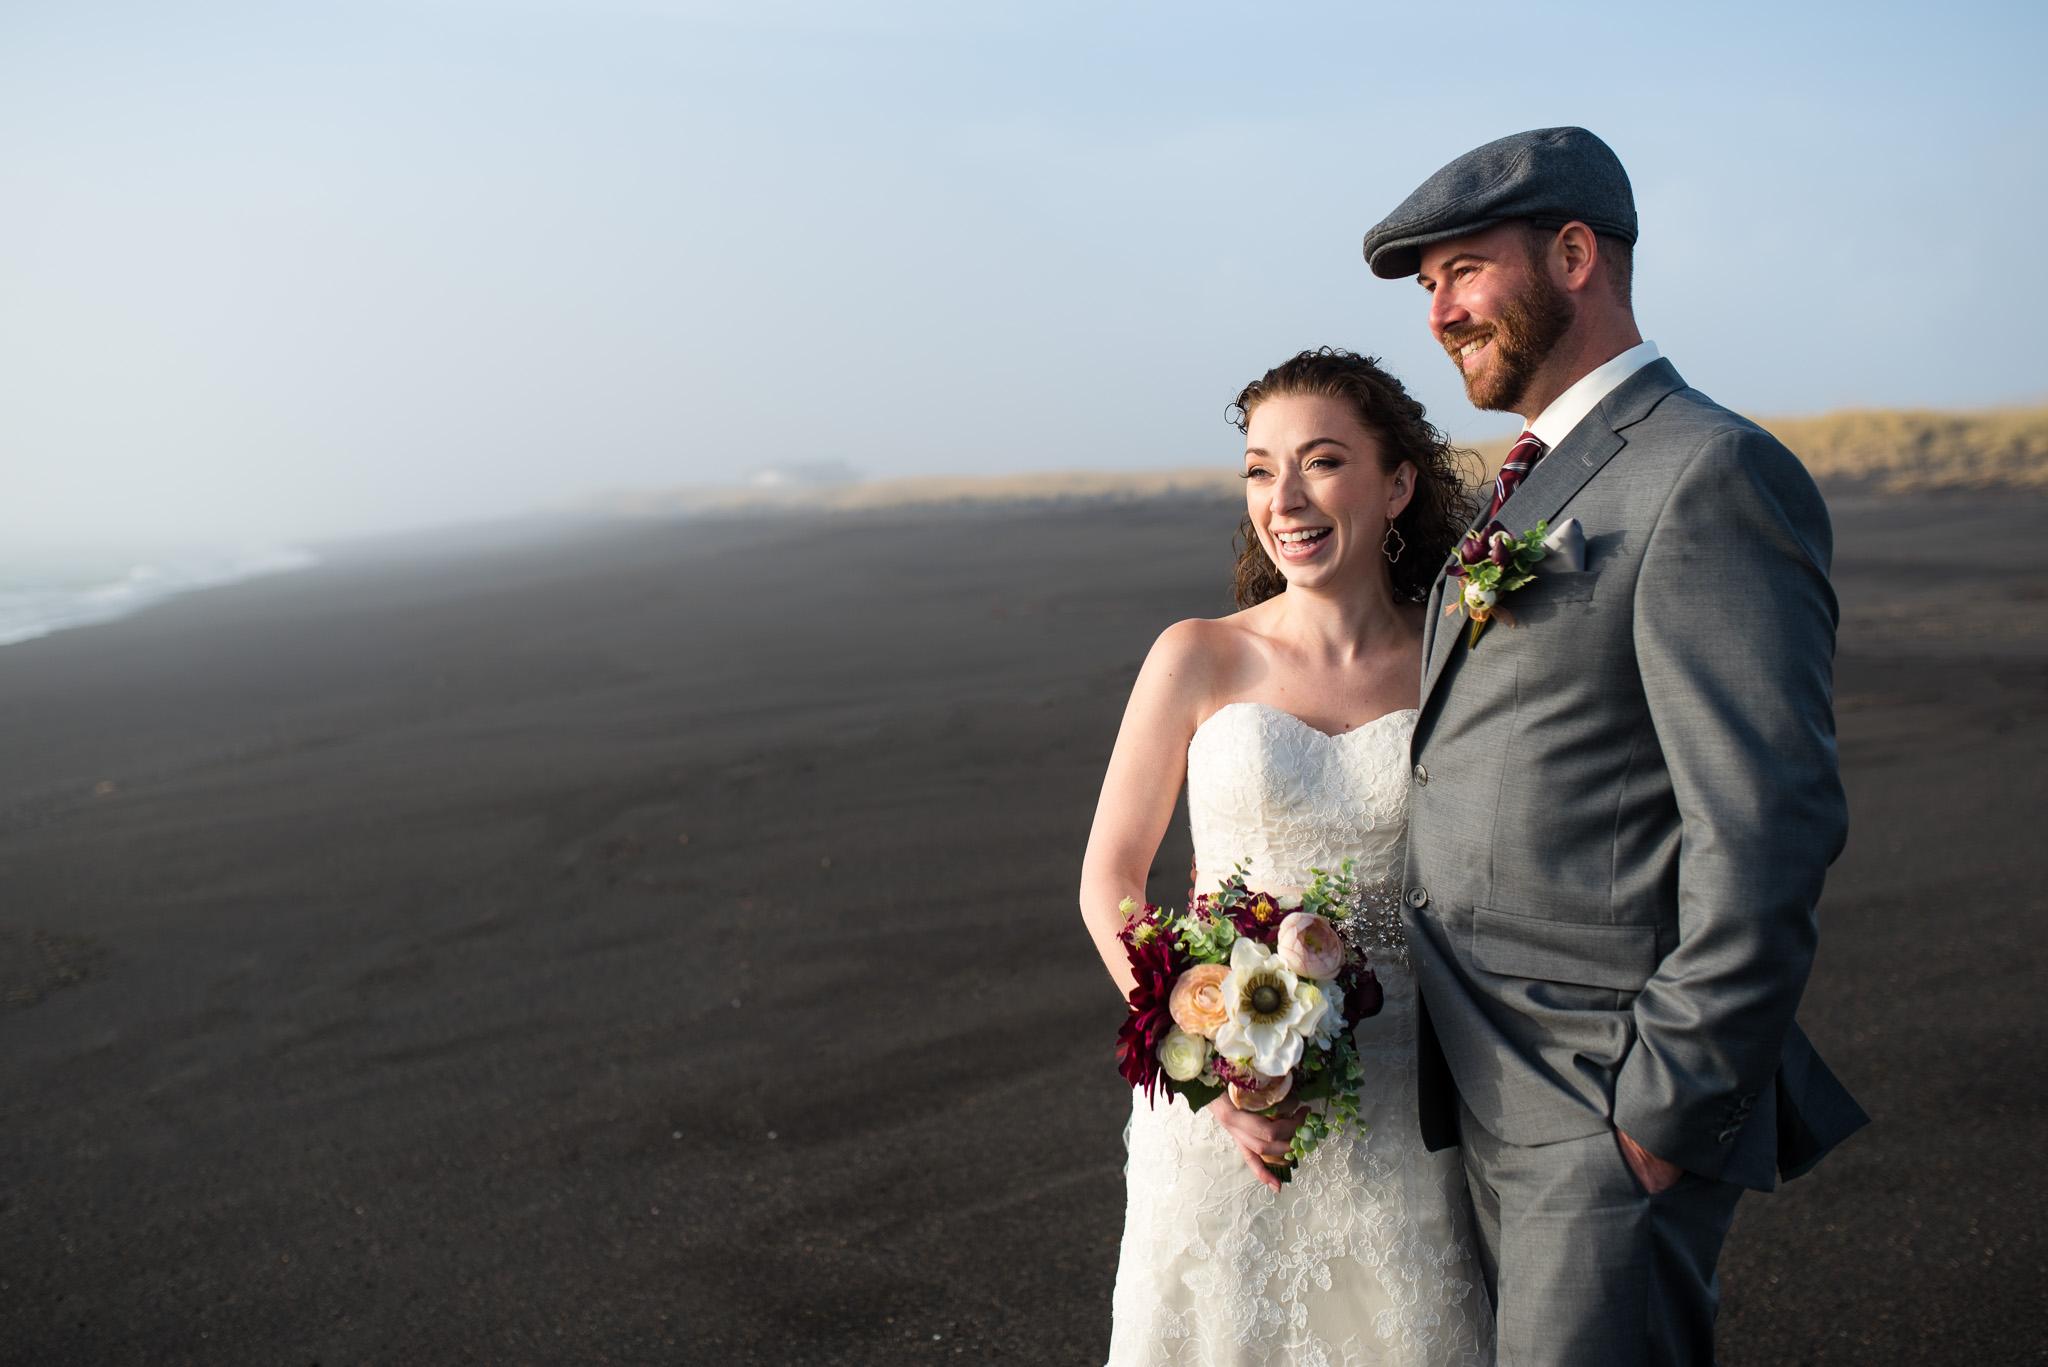 reykjavik-elopement-iceland-reykjanes-victoria-wedding-photographers-30.jpg